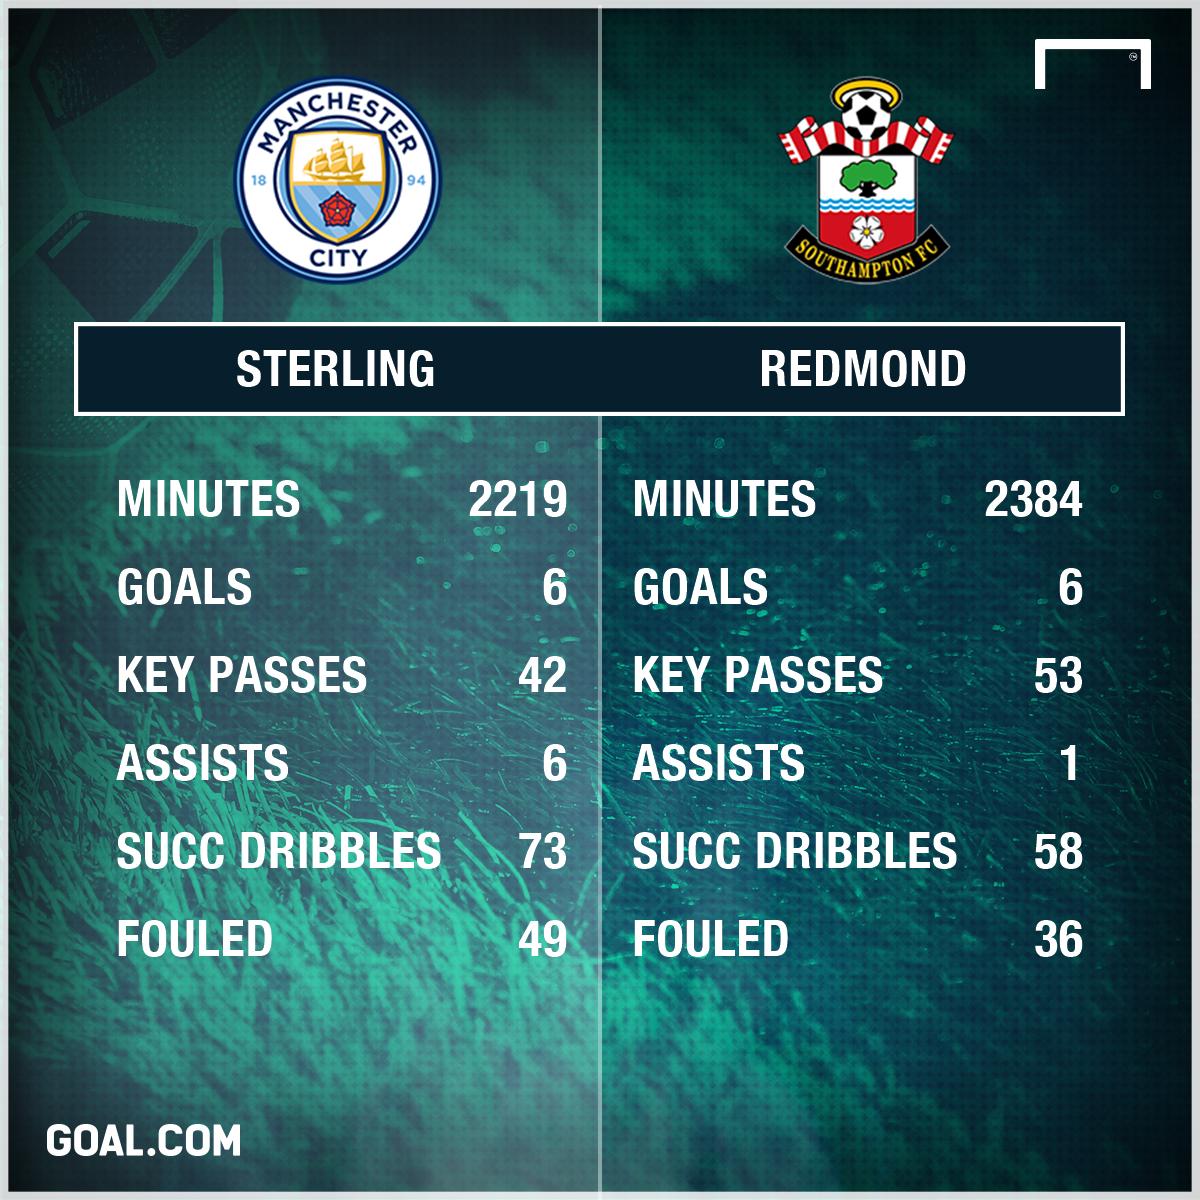 Sterling vs Redmond stats